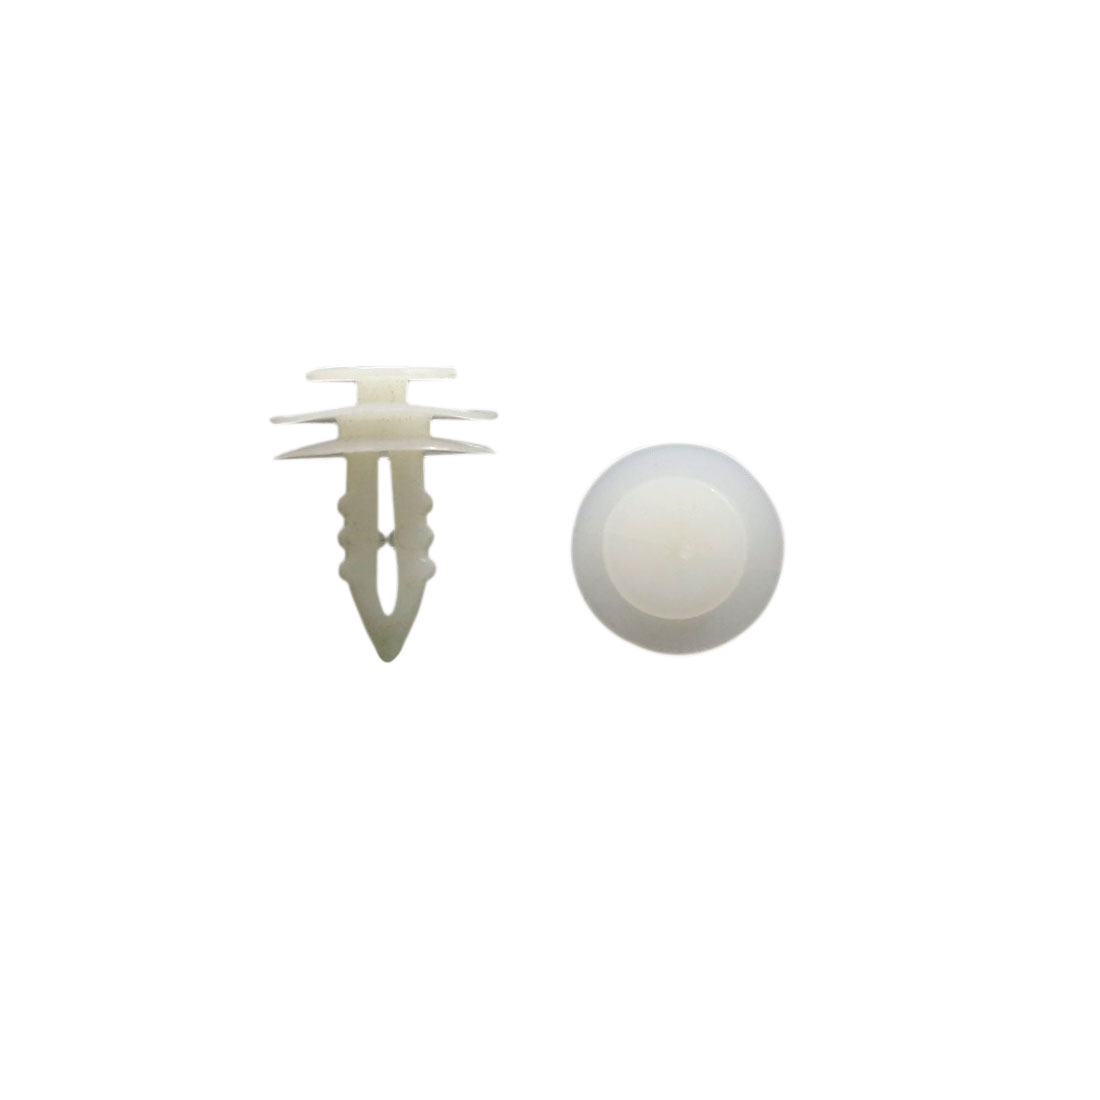 200 Pcs White Plastic Rivet Trim Fastener Moulding Clips 8mm x 19mm Fits Peugeot